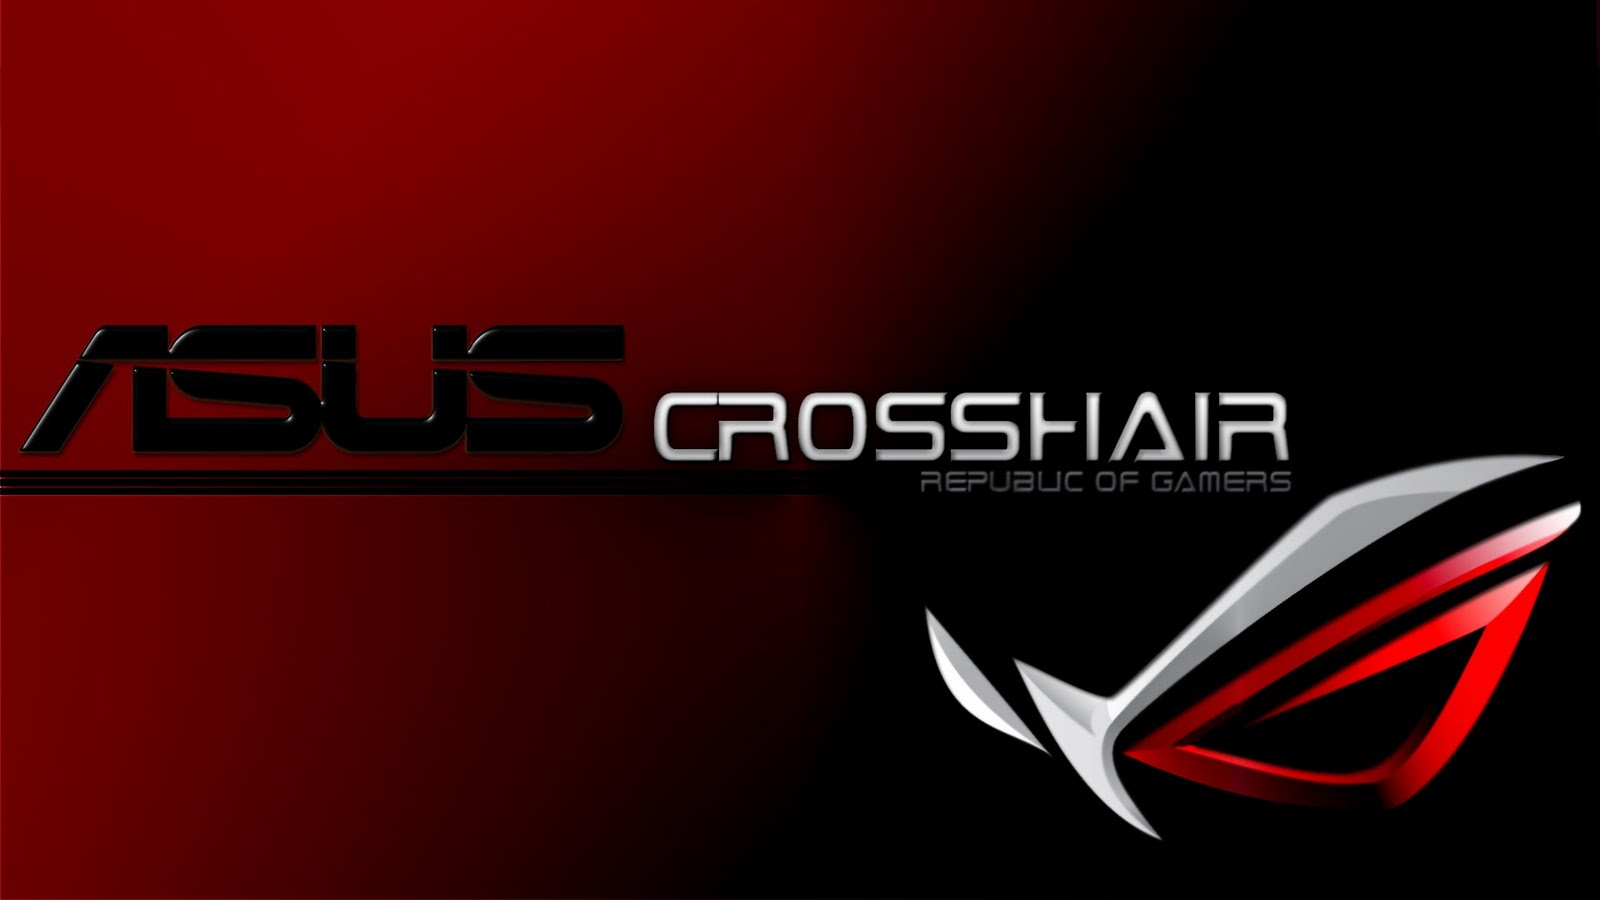 http://1.bp.blogspot.com/-bbbhI1c4YMY/TdAJ1Dt6s8I/AAAAAAAABls/LSRBZg-j1OM/s1600/Asus-Crosshair-wallpapers.jpg